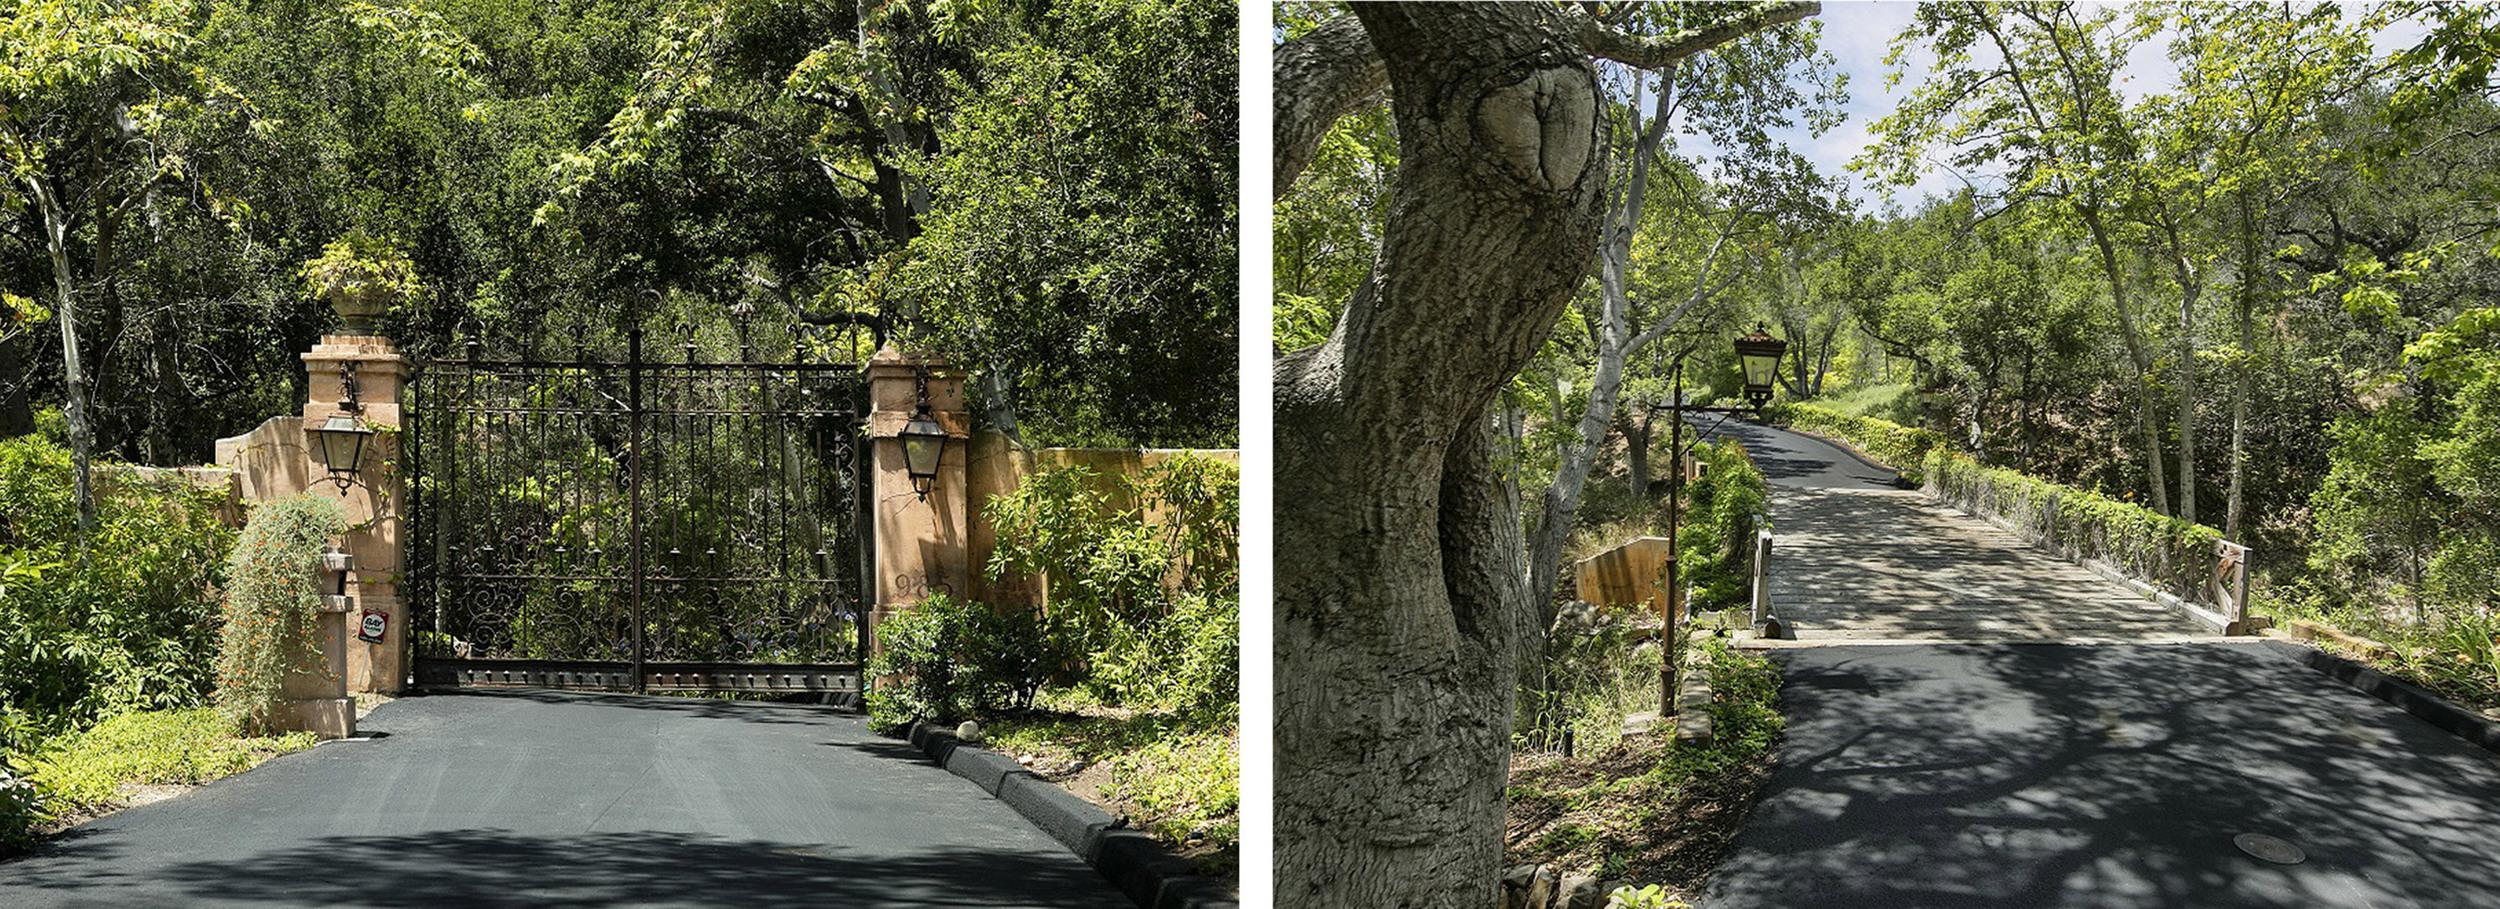 Loggin-Montecito-entry-1.jpg